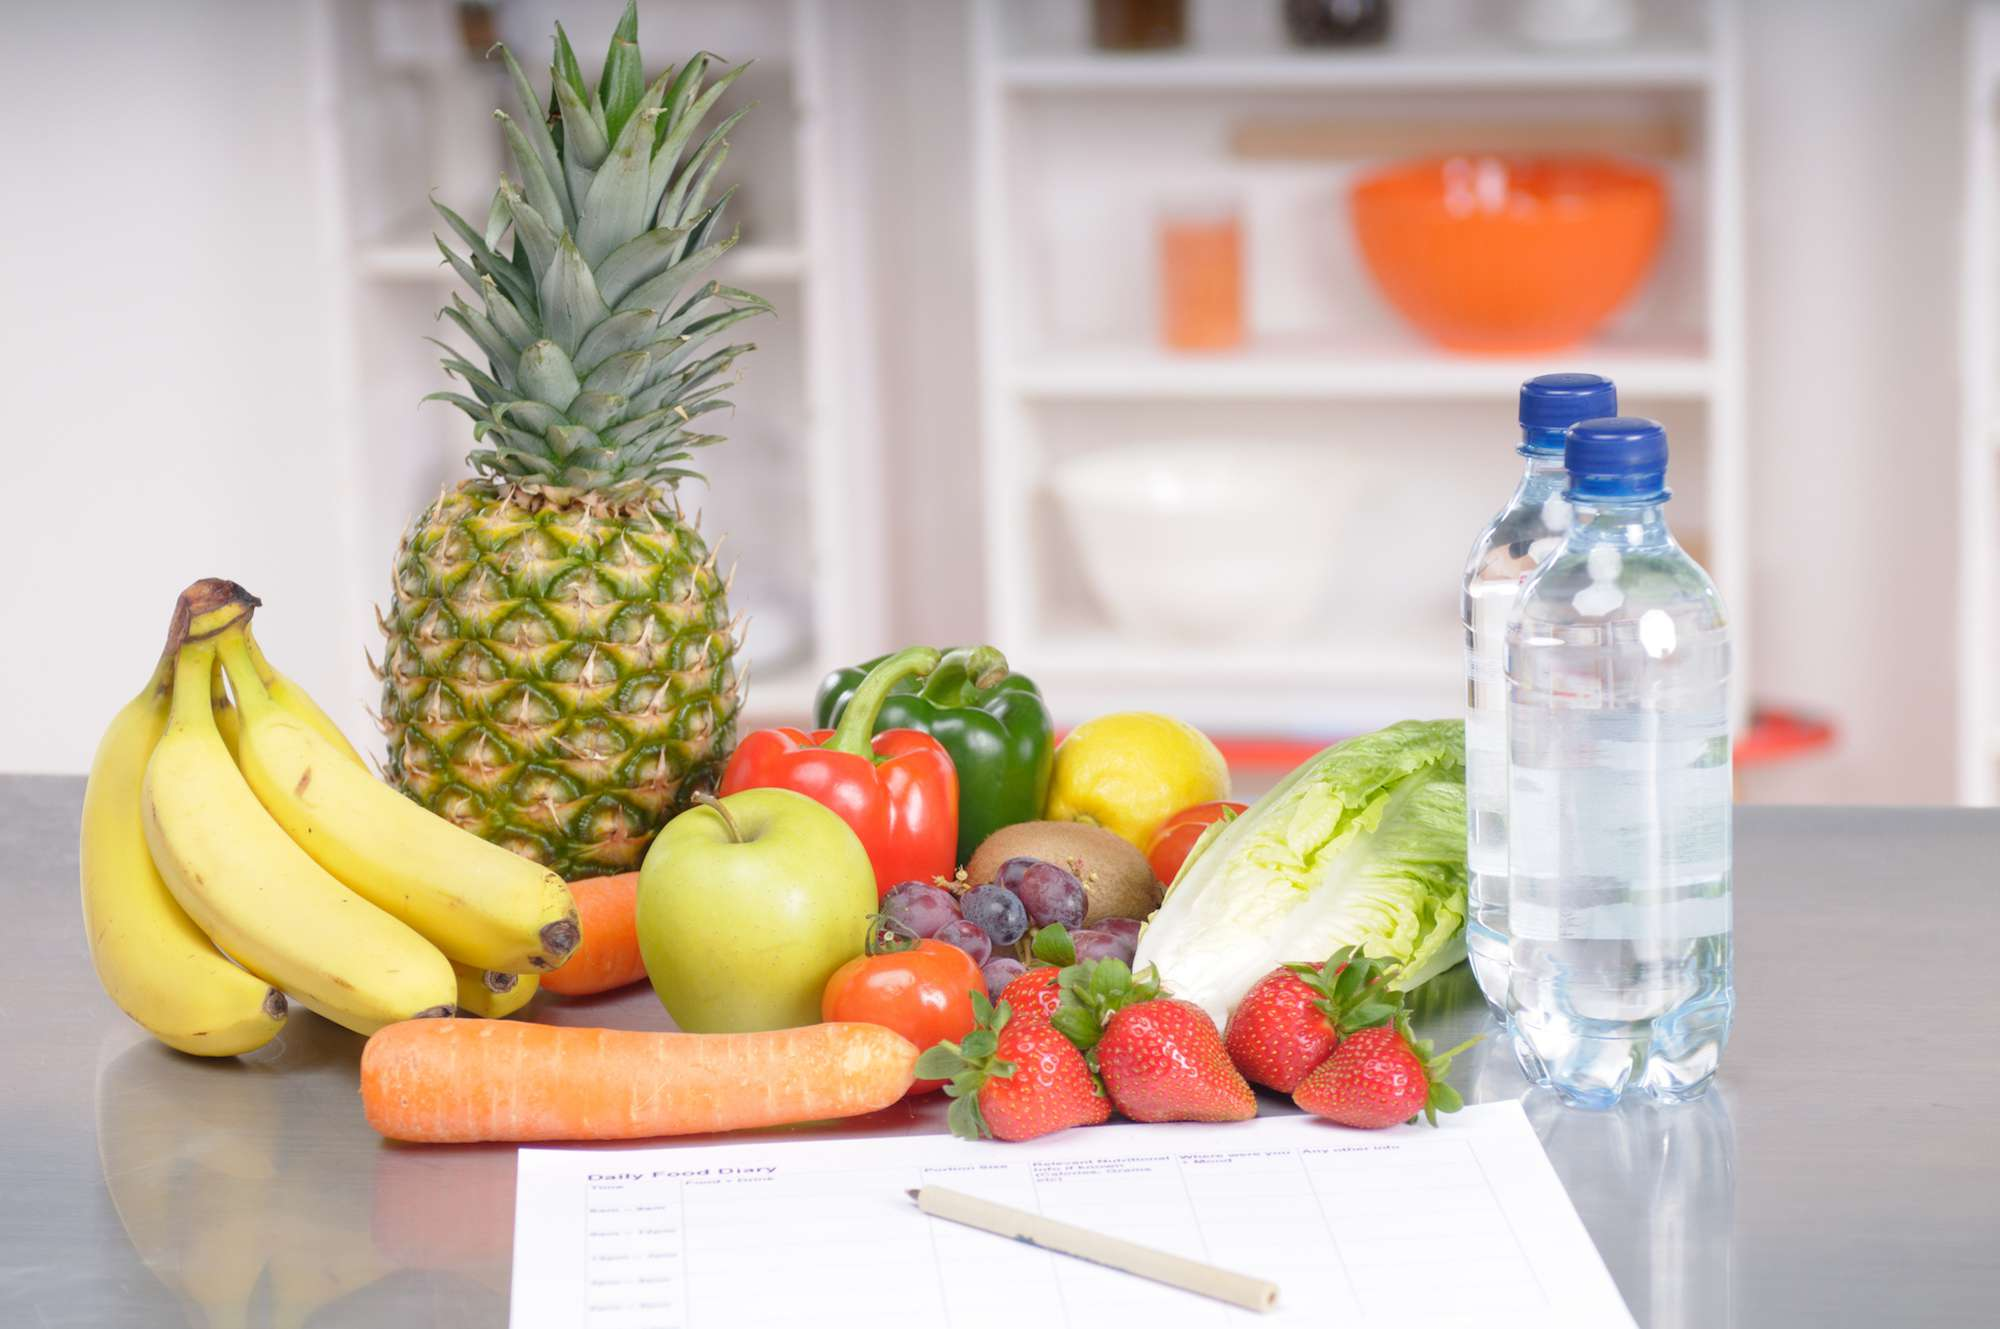 Fruits around a food journal